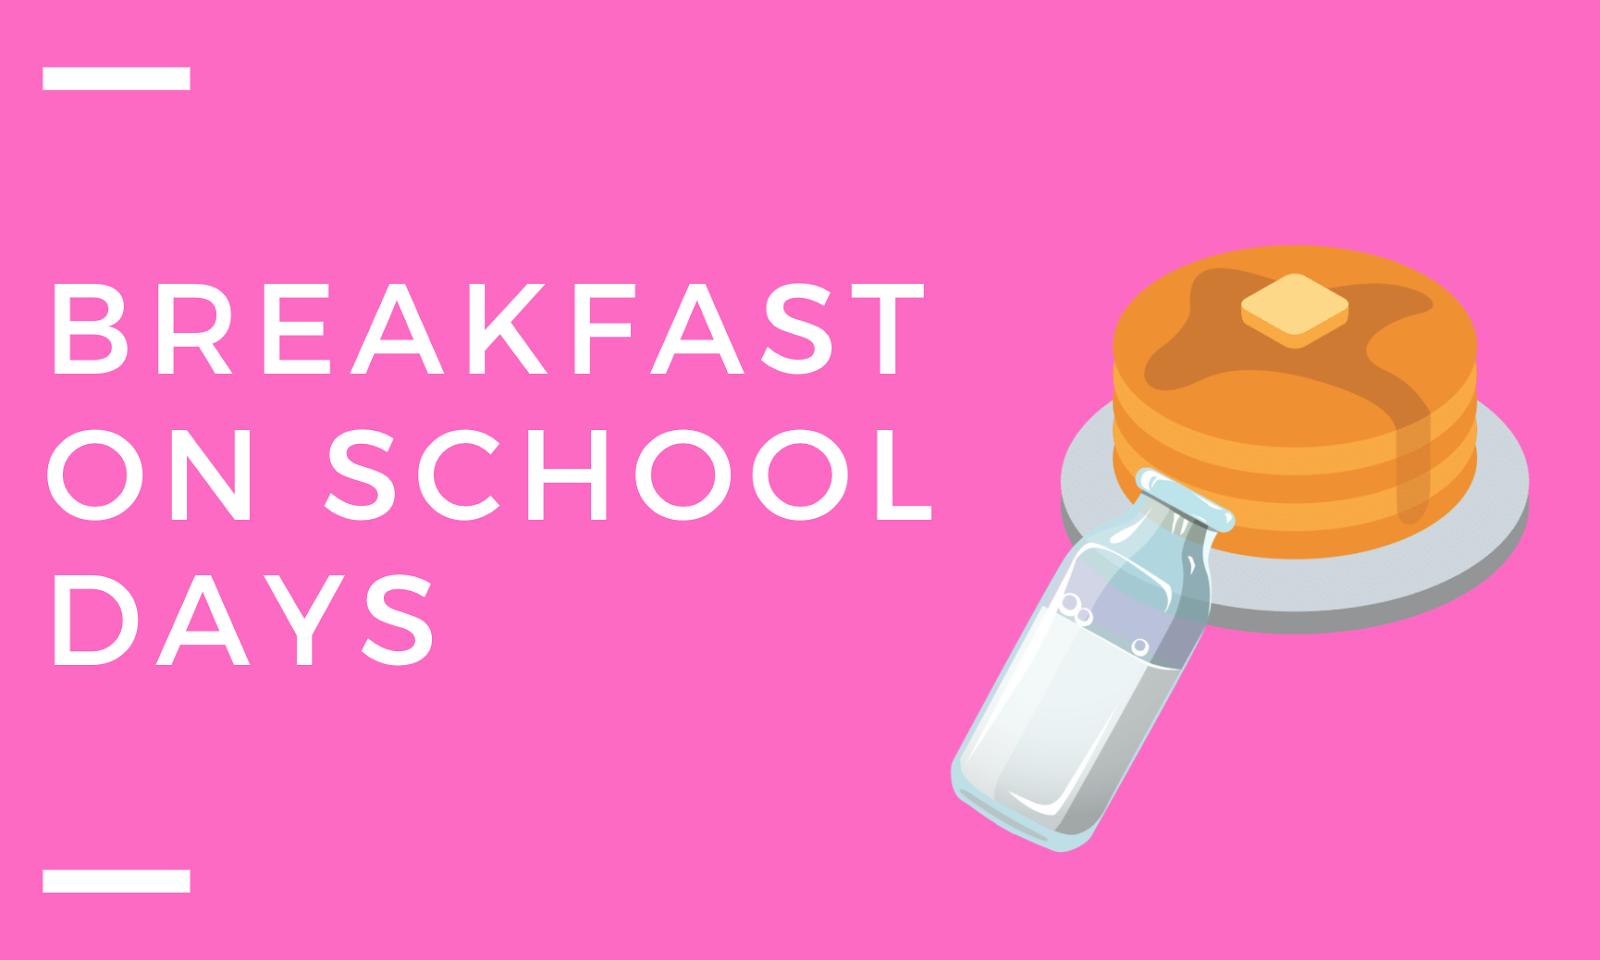 School days made easier...Part 3 (Focus on Breakfast & Virtual Days)